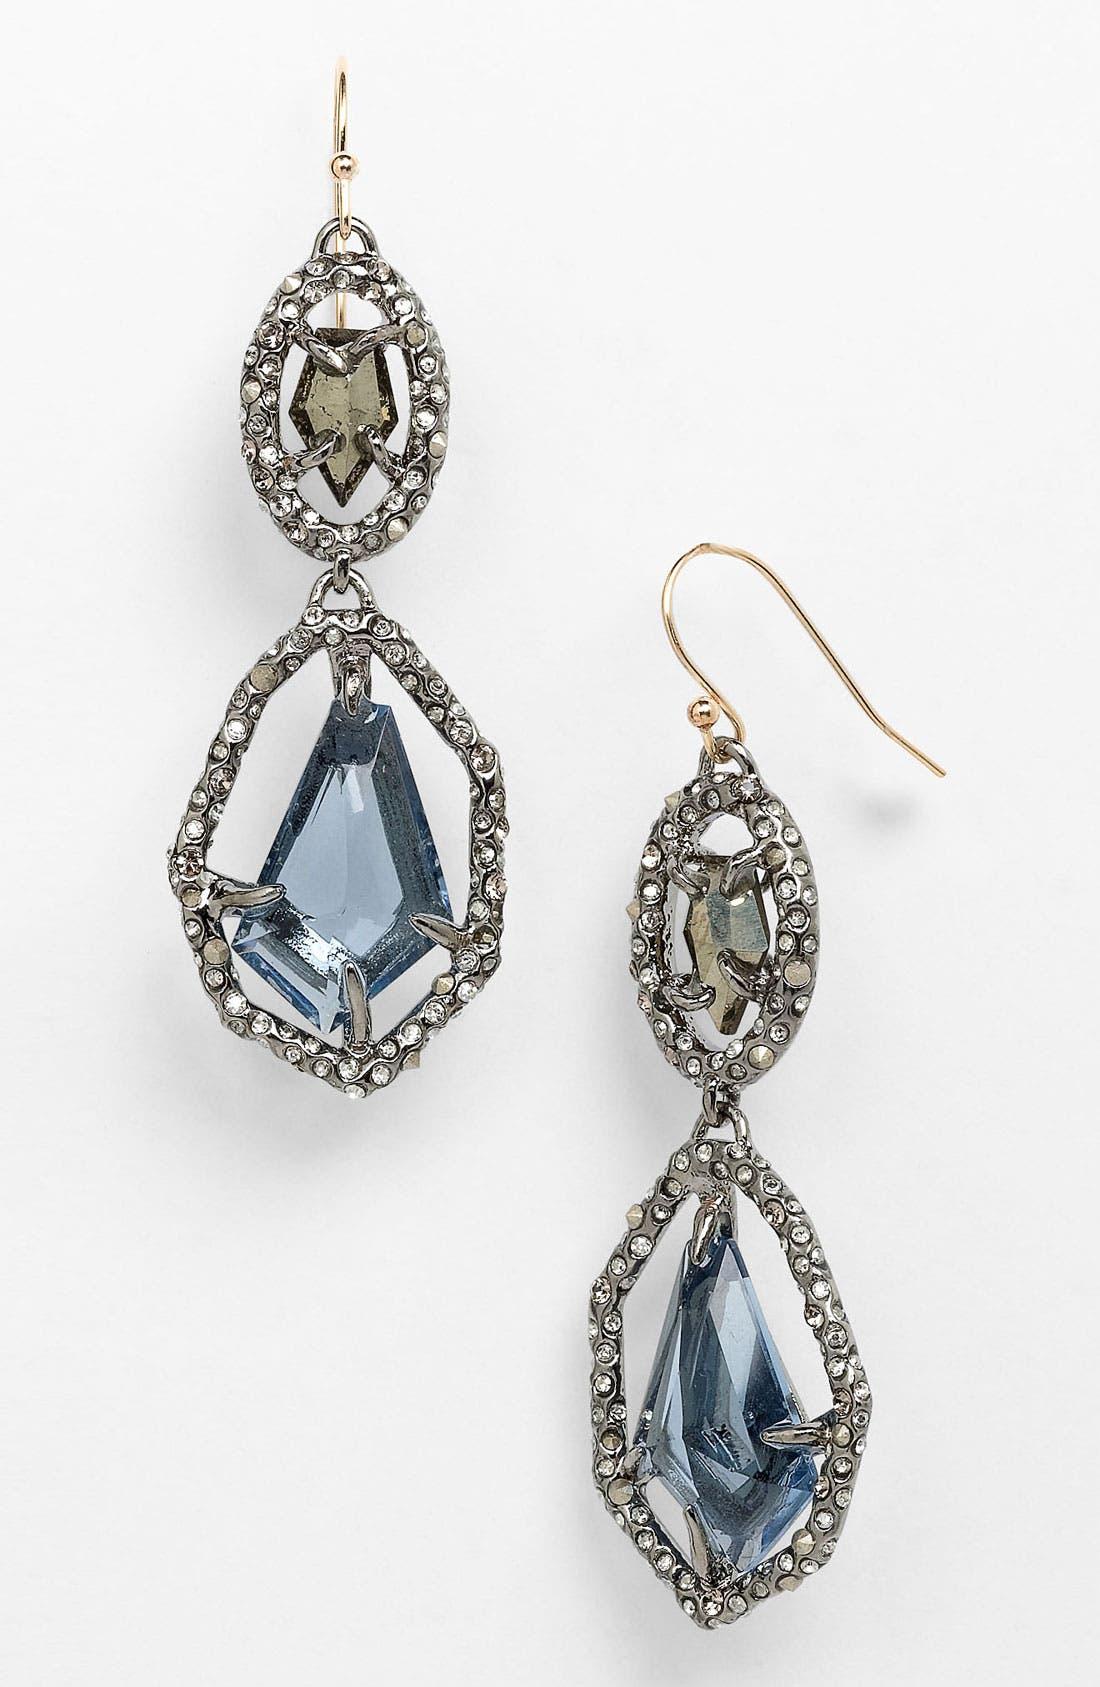 Alternate Image 1 Selected - Alexis Bittar 'Miss Havisham - Delano' Deco Drop Earrings (Nordstrom Exclusive)